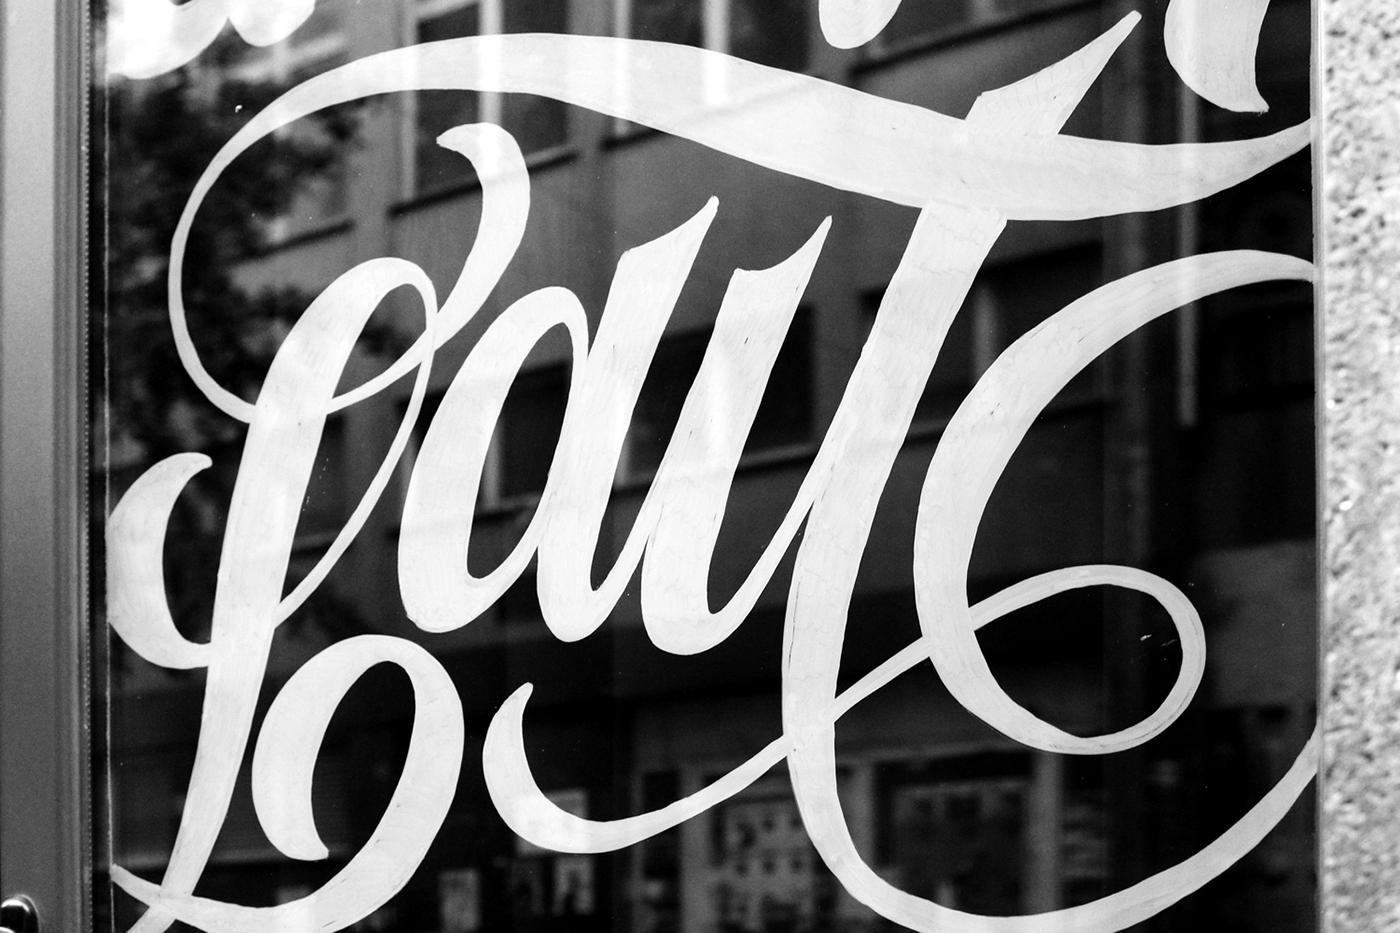 caligrafia caligraphy graphic hugomoura lettering painting   porto xesta xestaone xestastudio